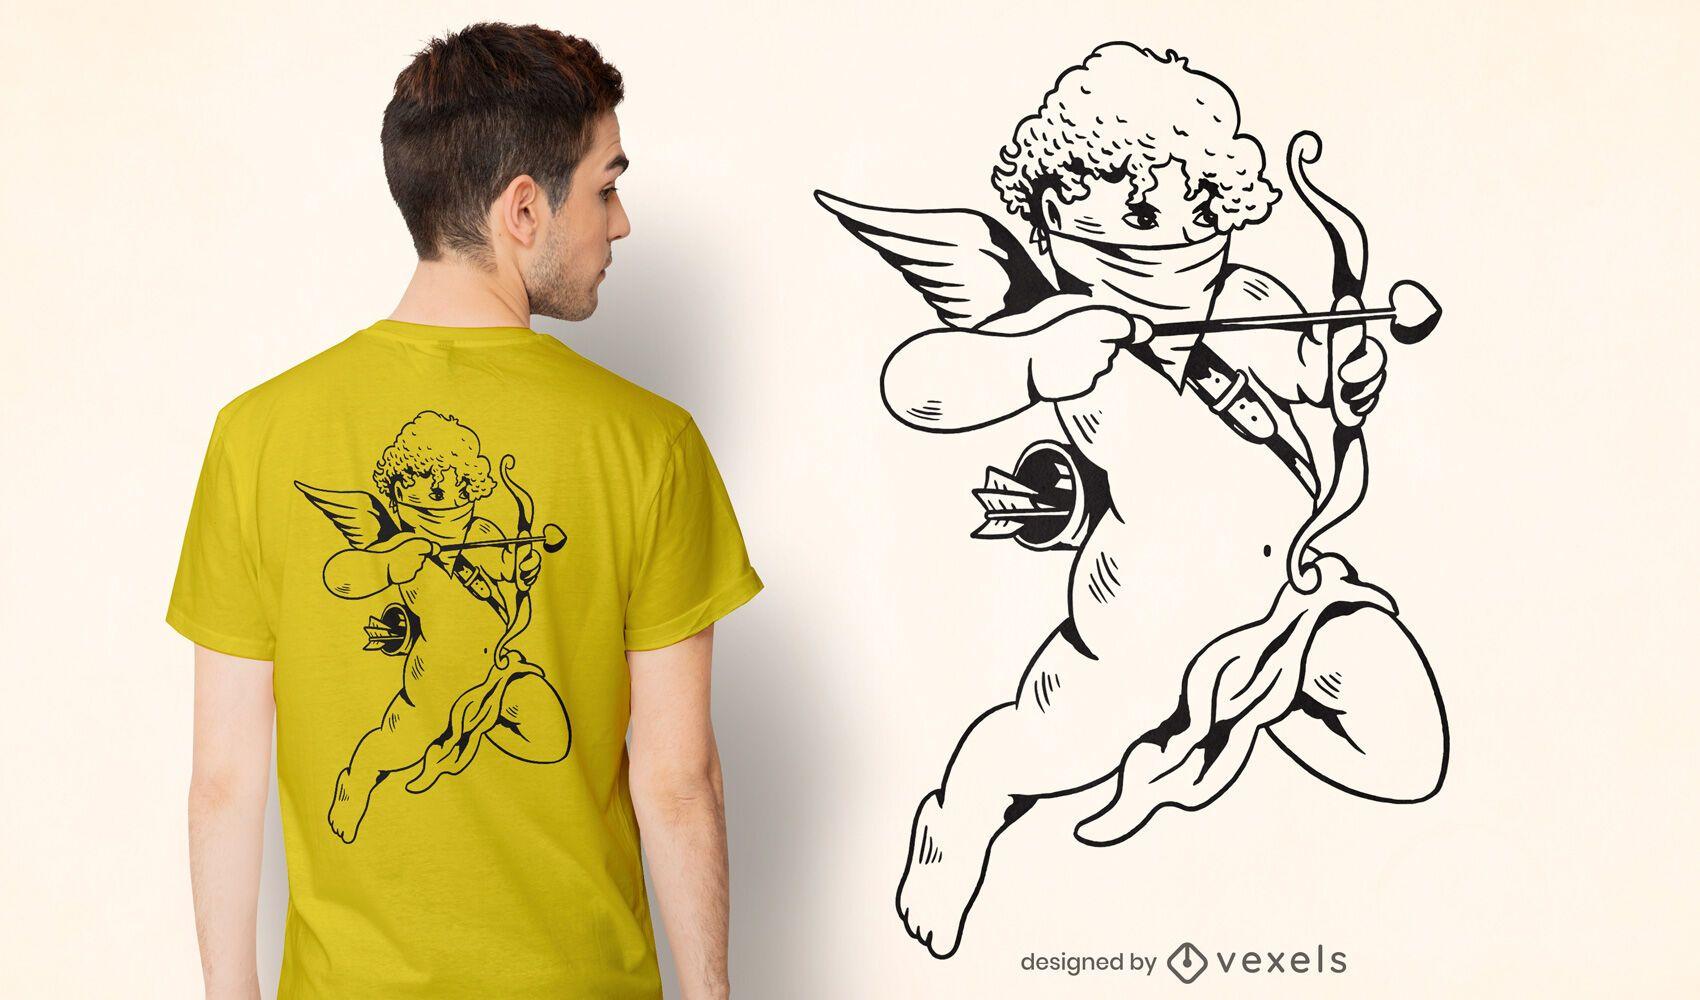 Bandana cupid t-shirt design